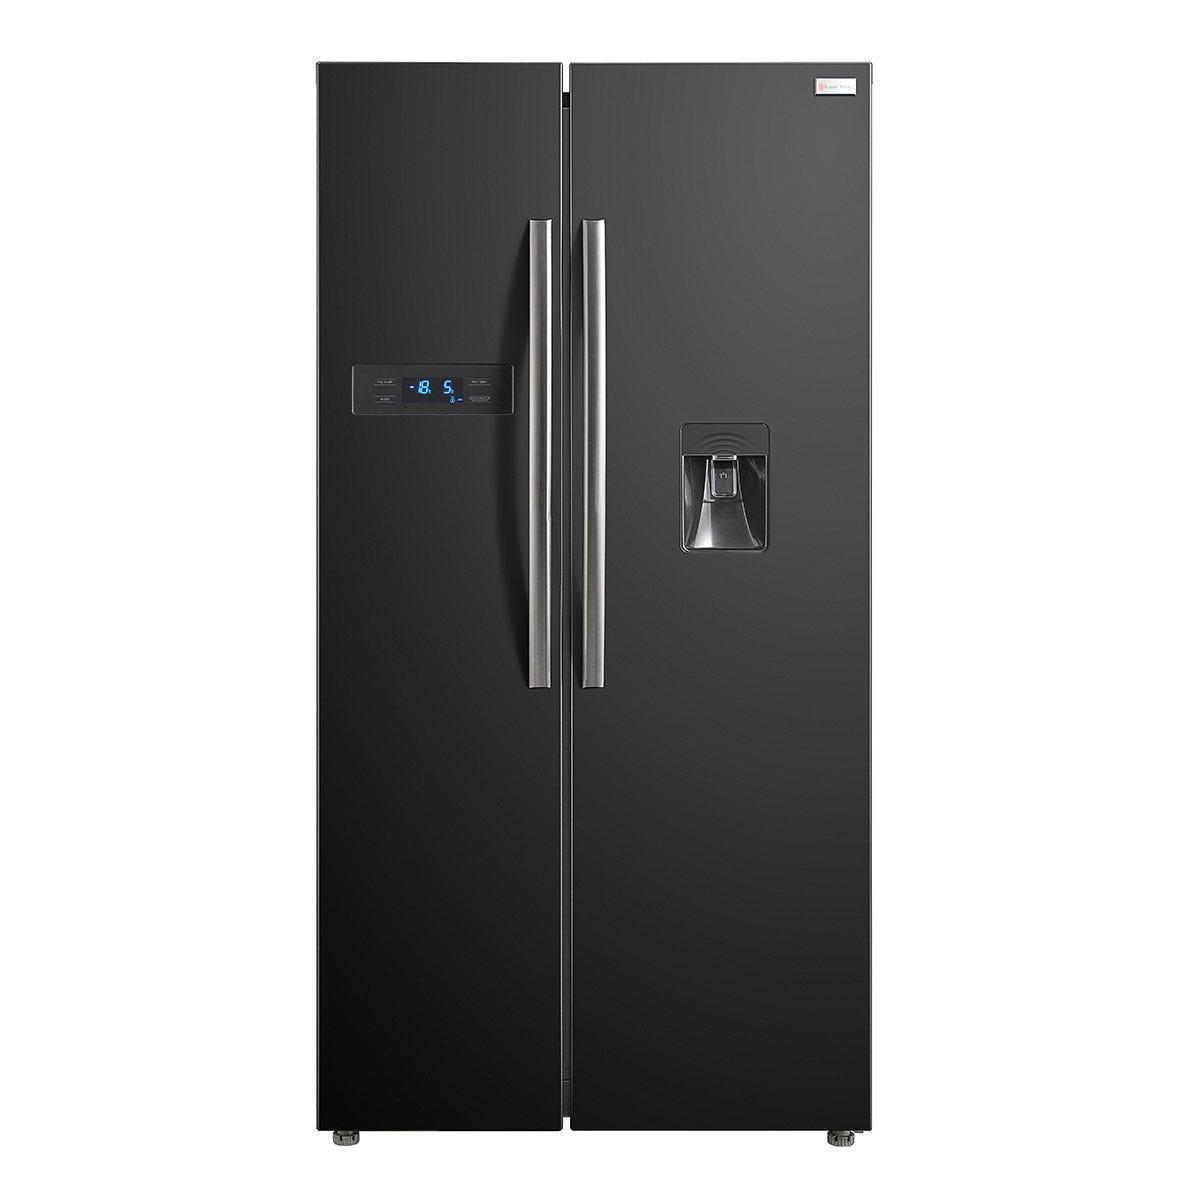 Russell Hobbs RH90FF176B 510L Wide American Style Fridge Freezer - Black